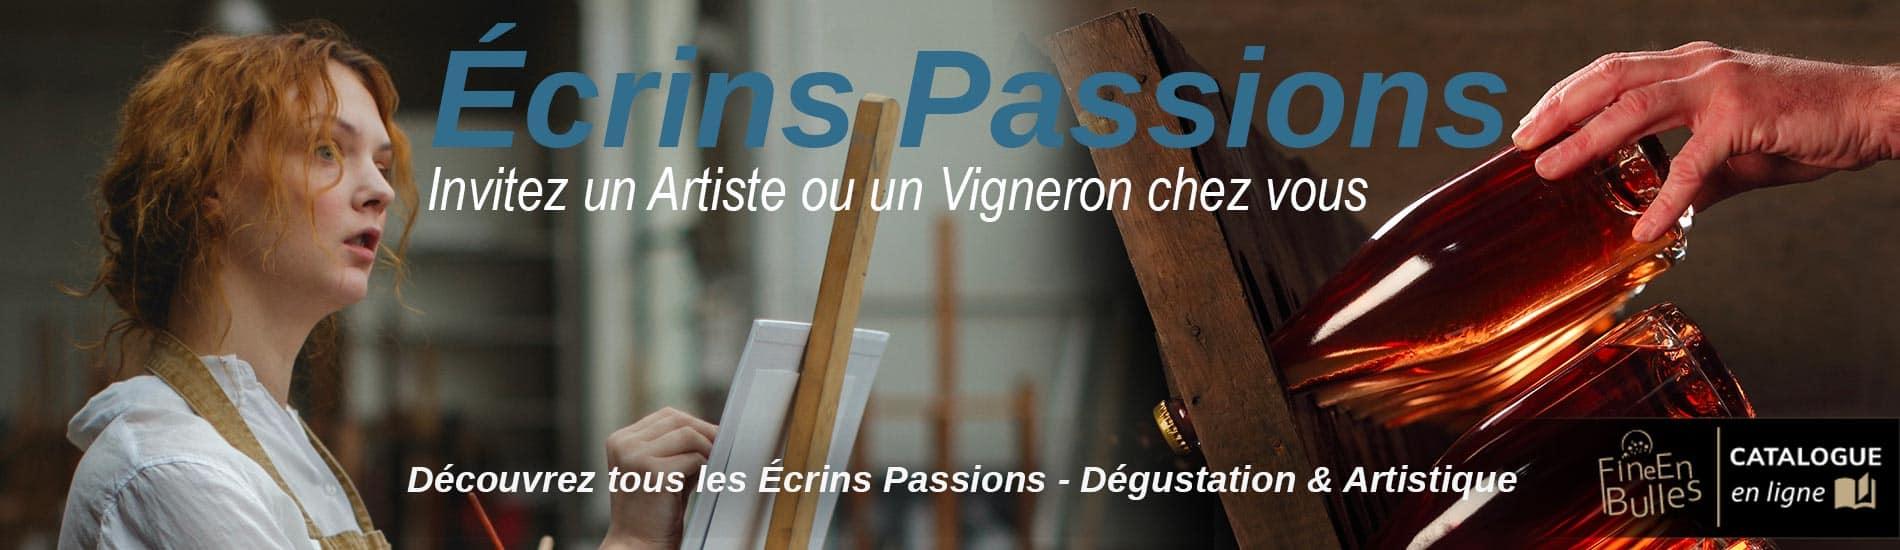 ecrins passions